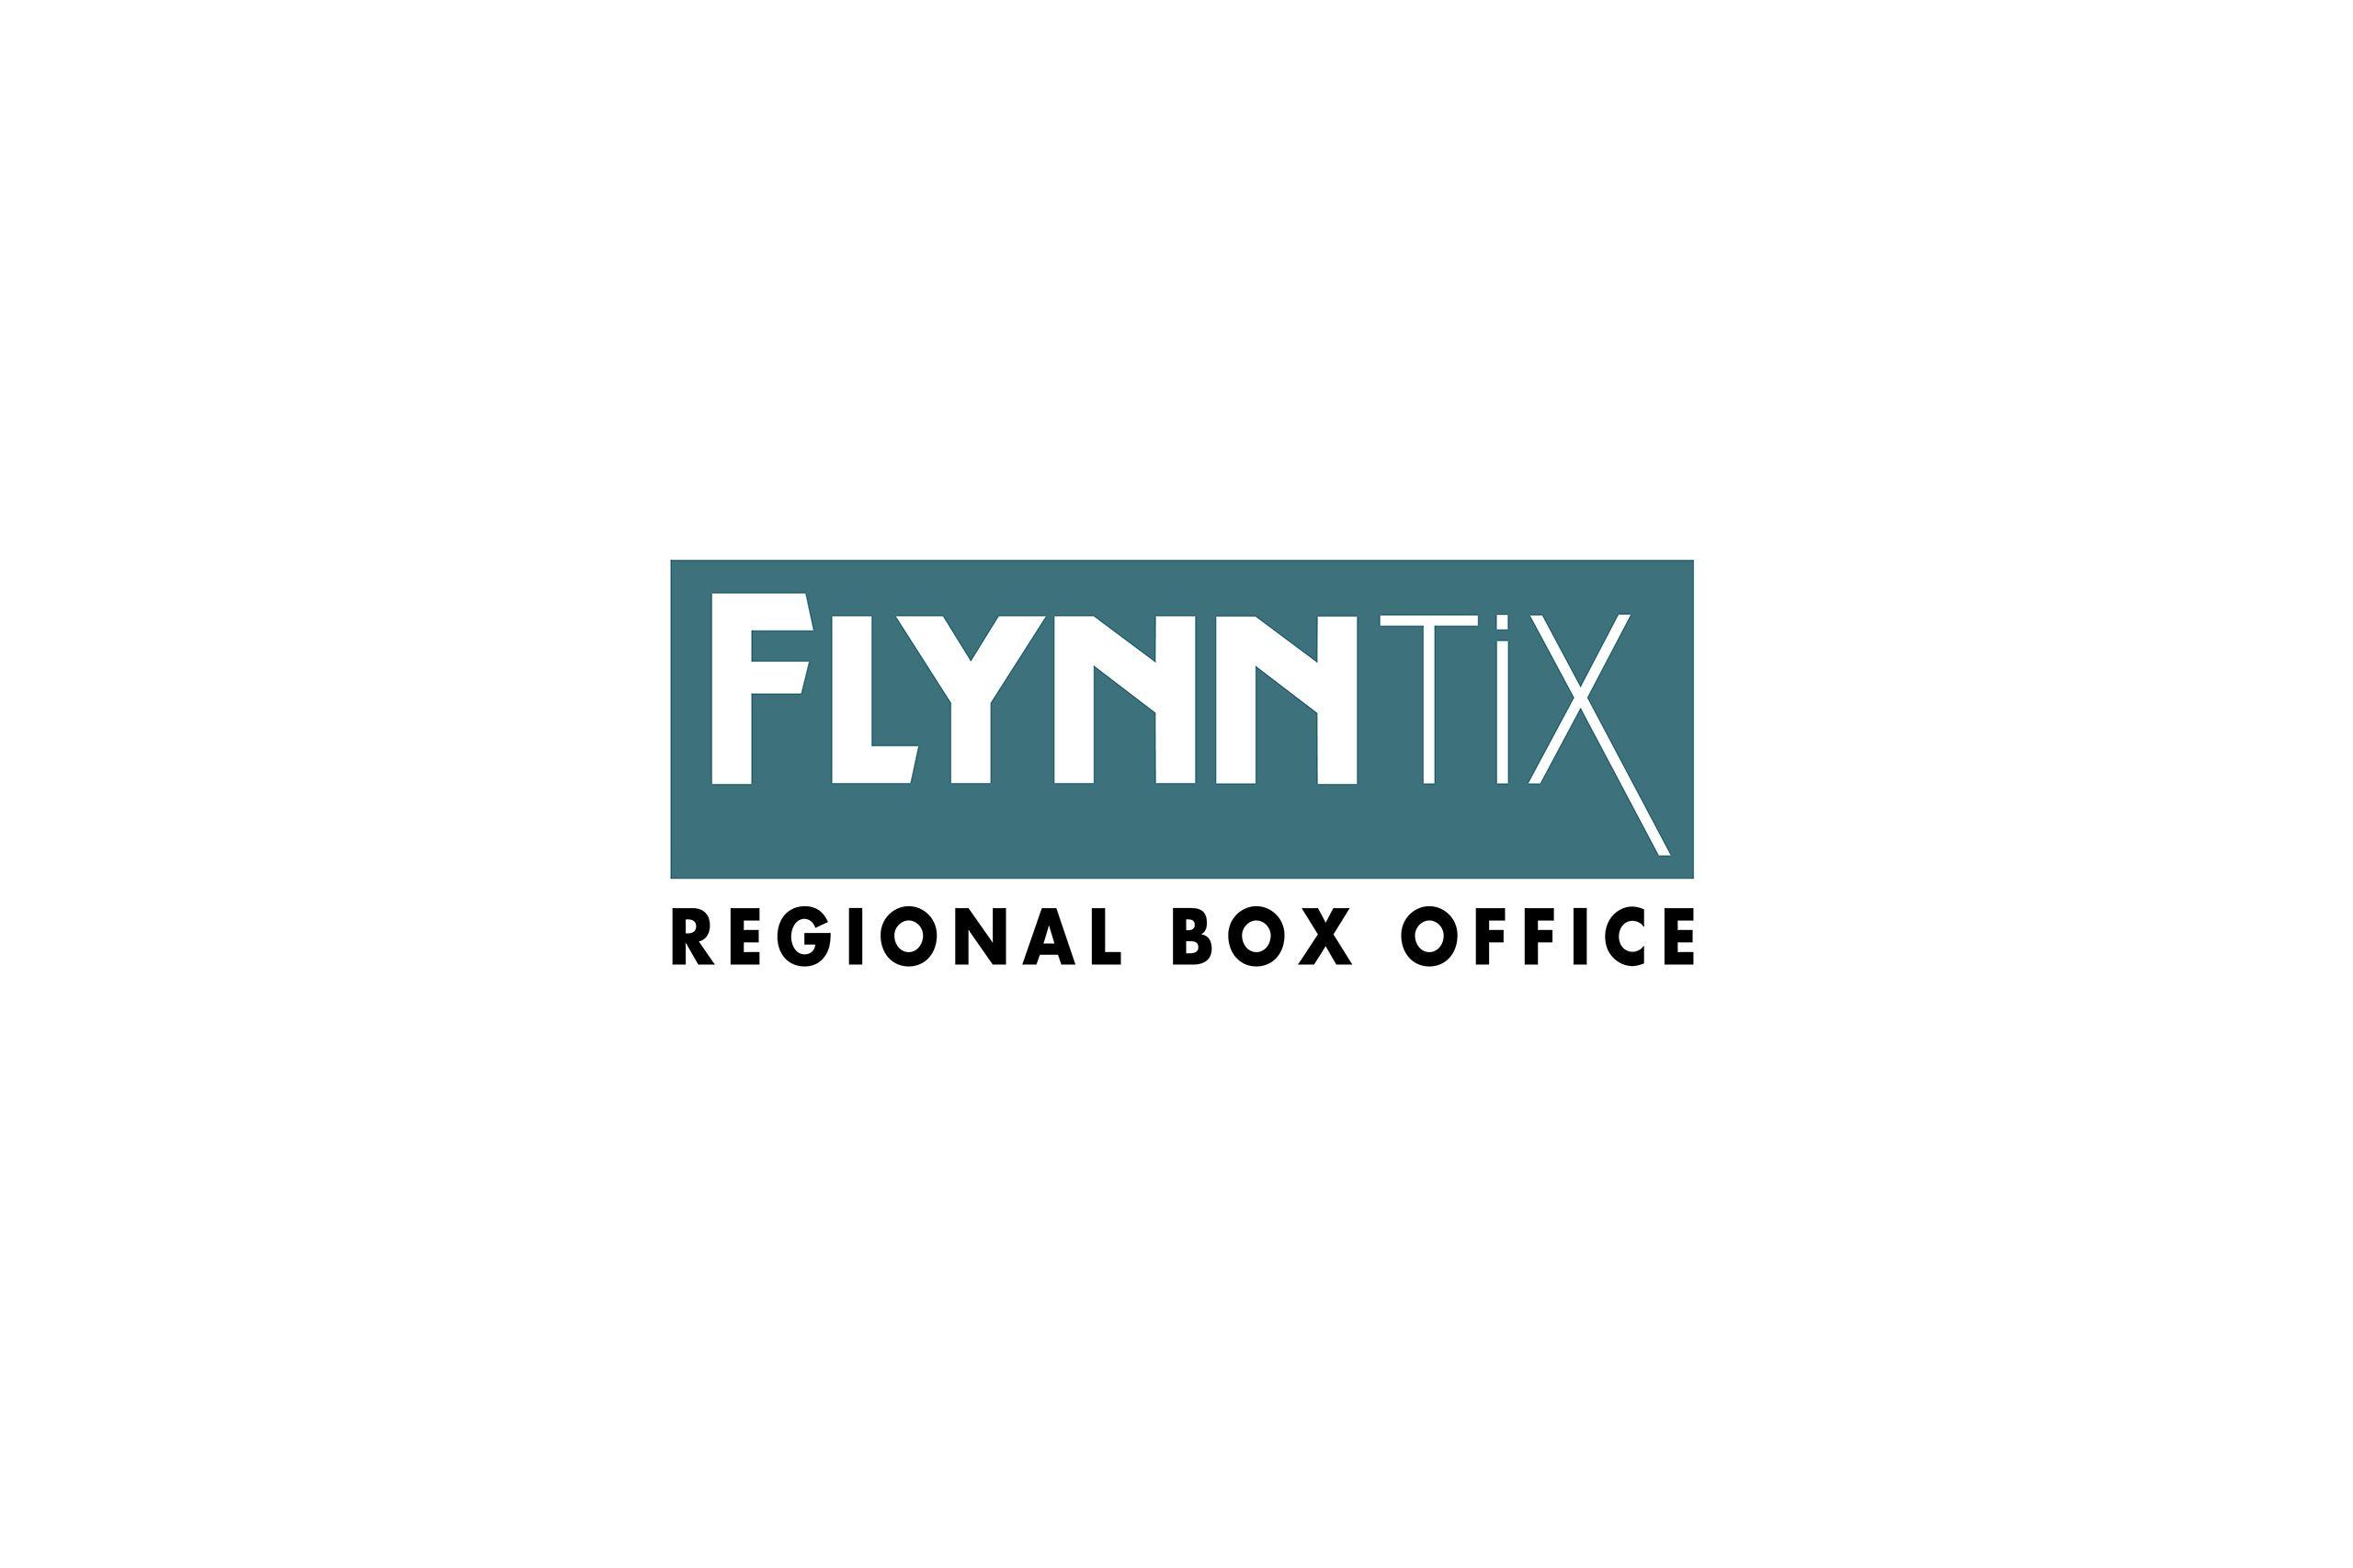 FLYNNTIX.jpg